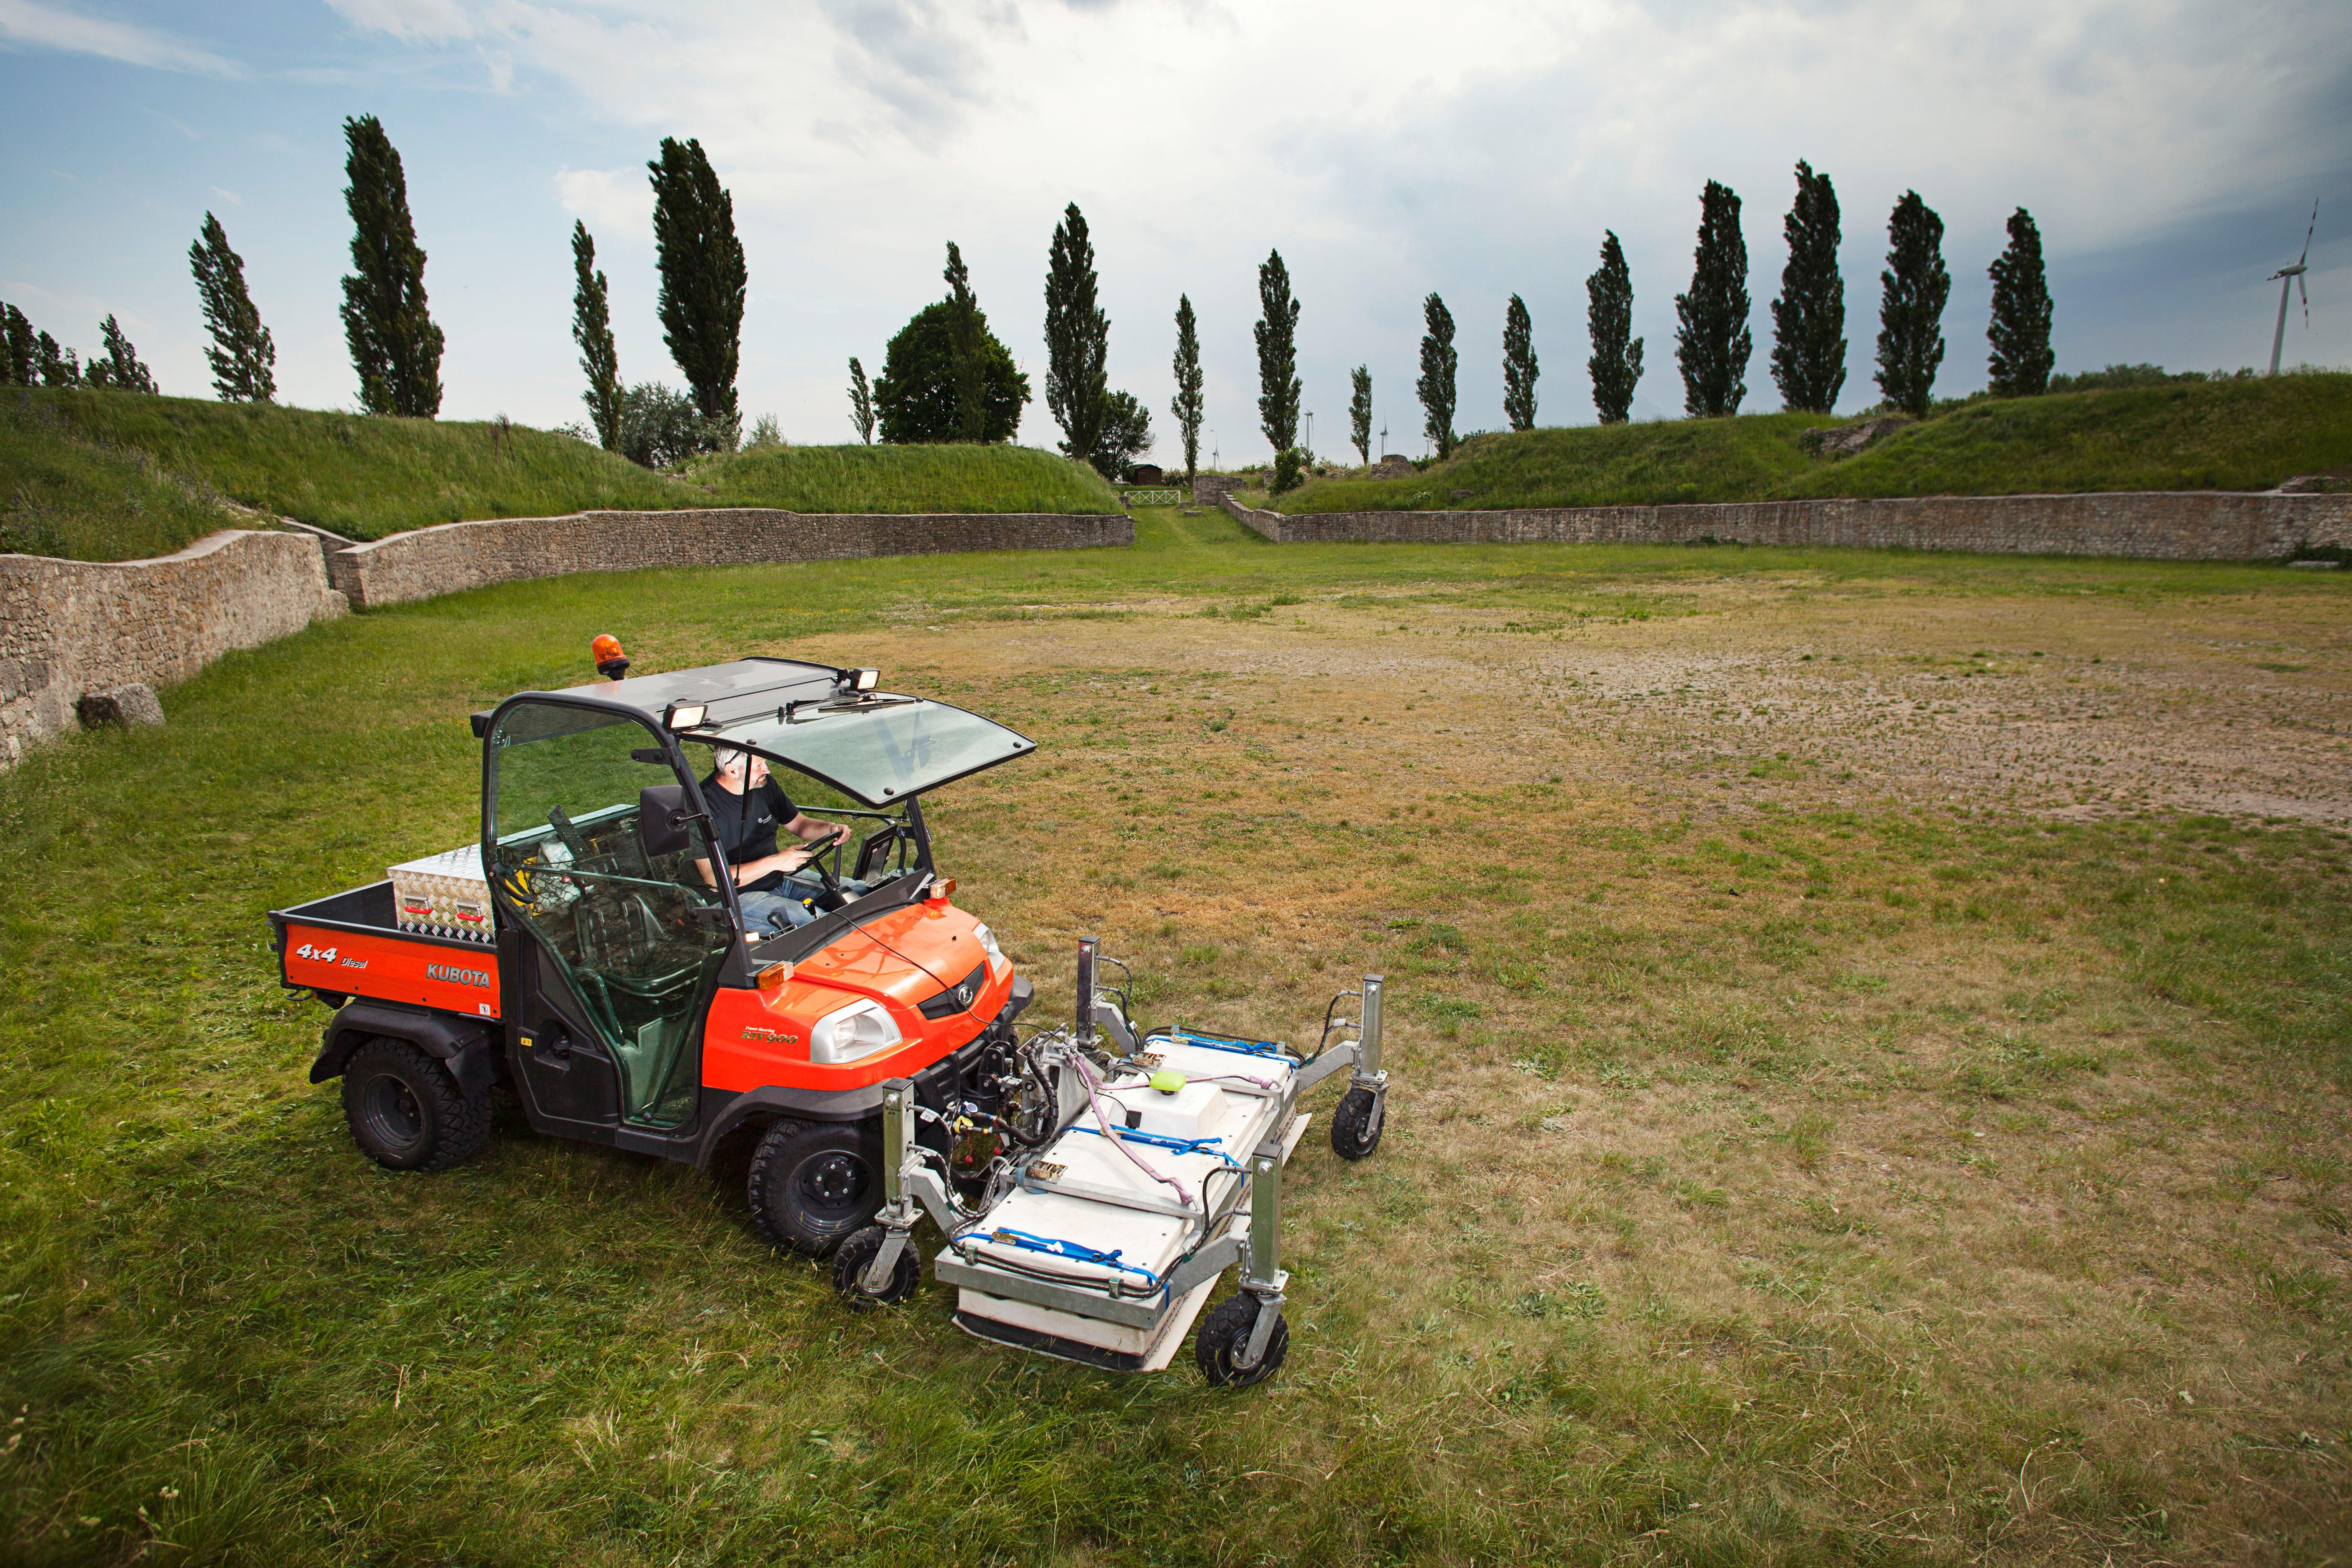 Motorized ground-penetrating radar